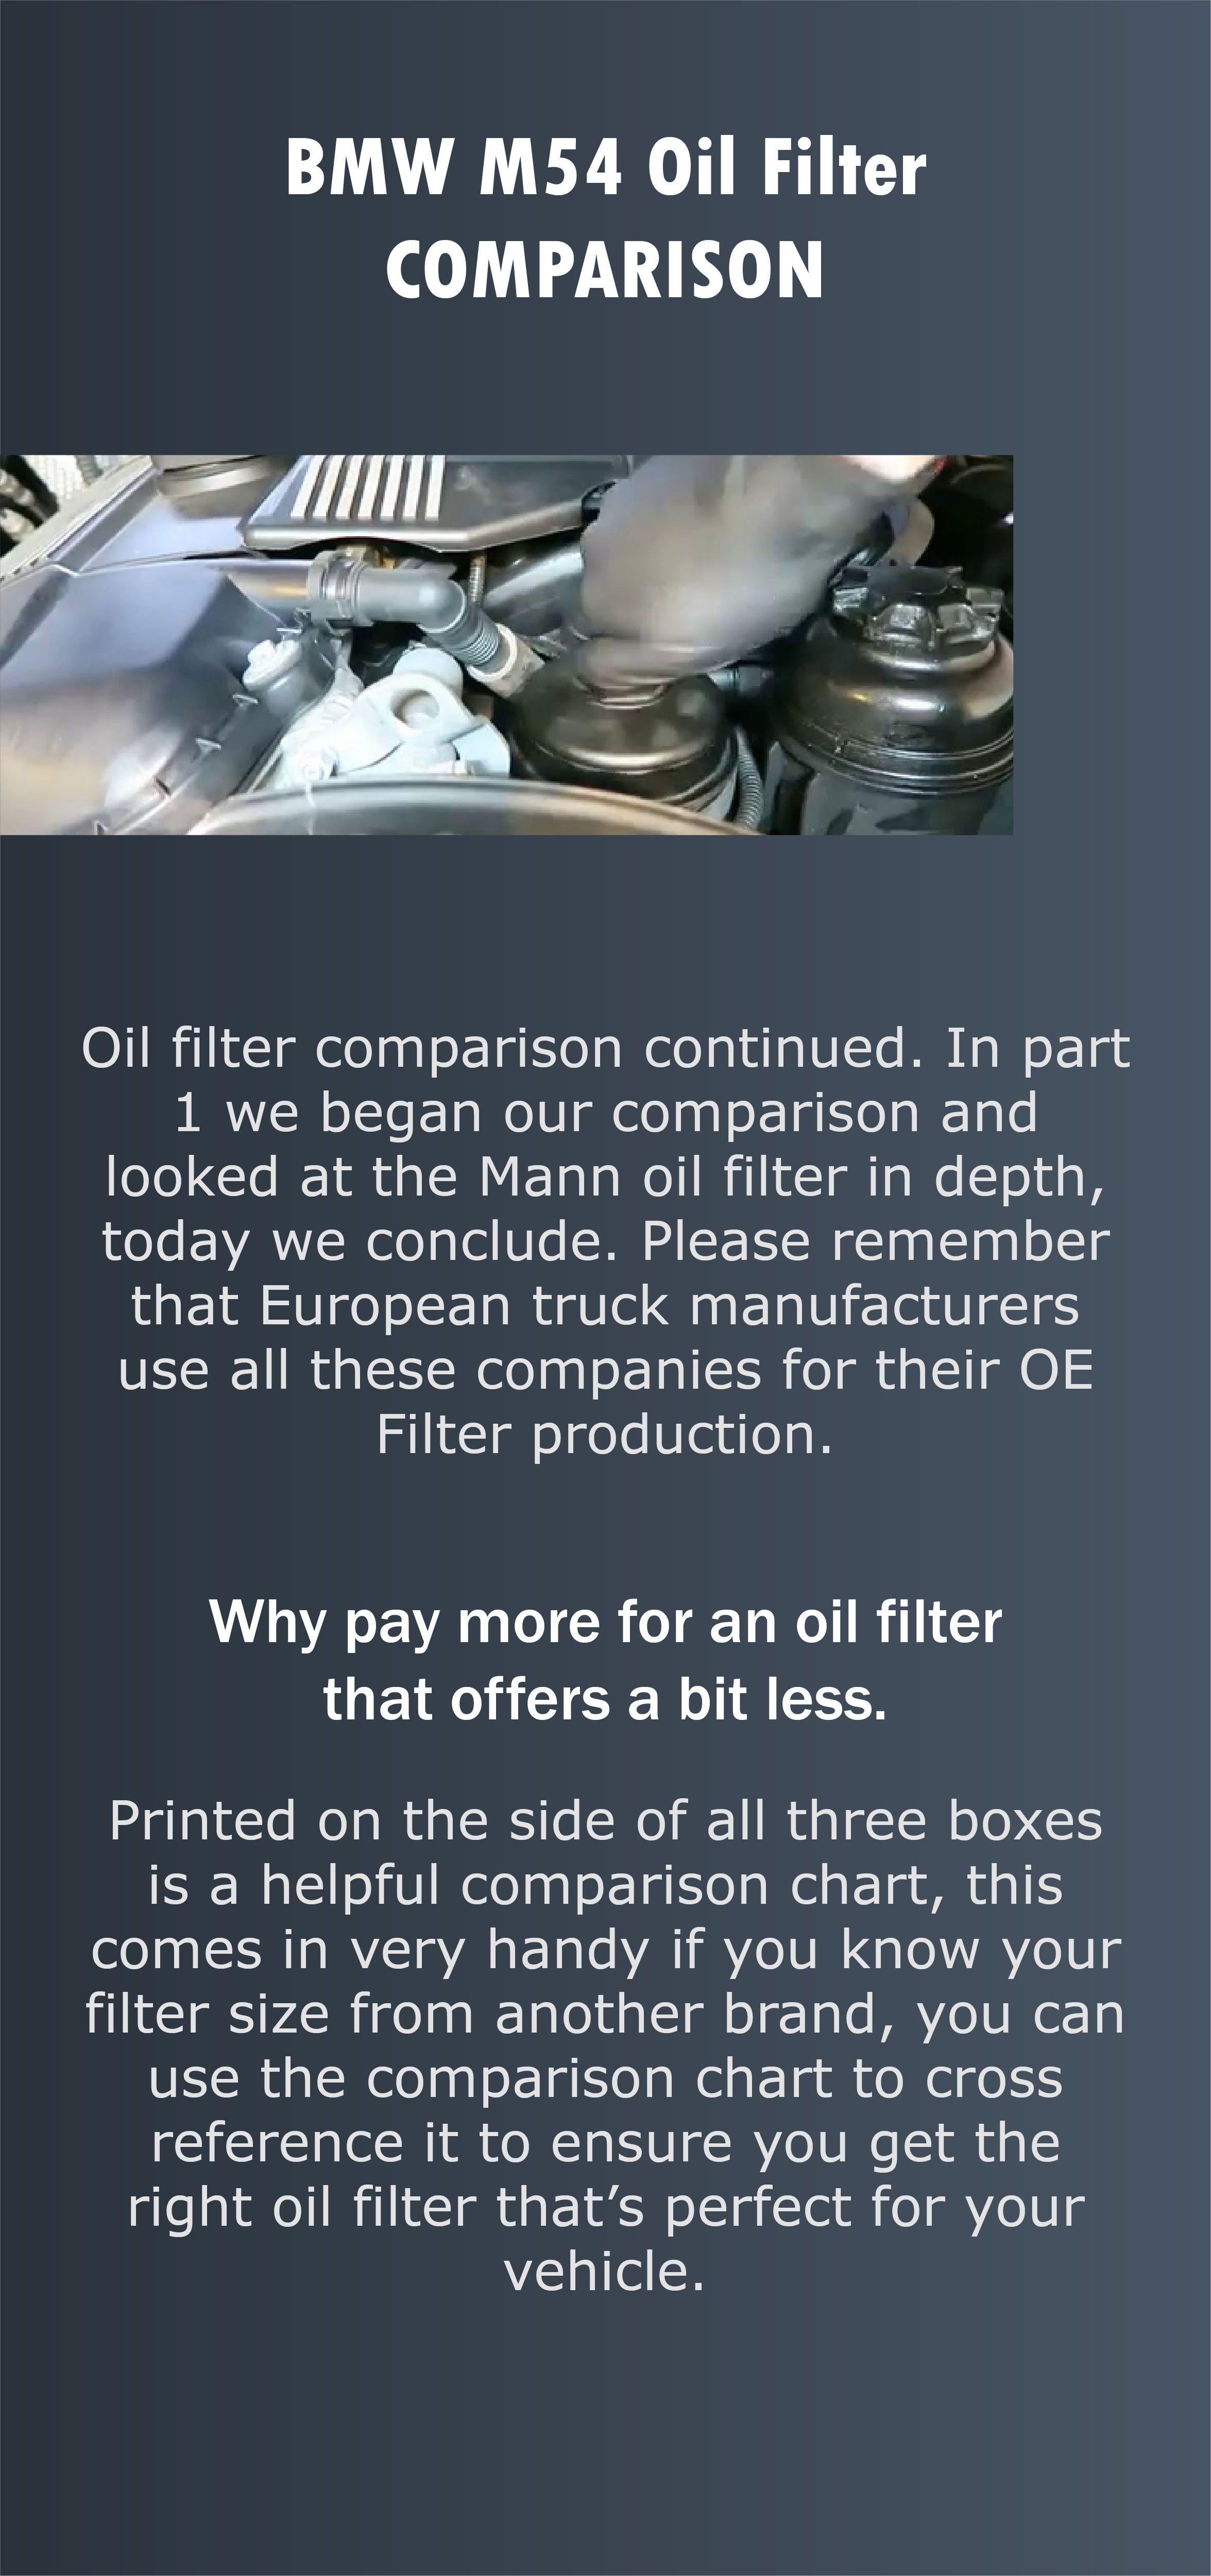 Bmw M54 Oil Filter Comparison Bmw M54 Oil Filter Bmw